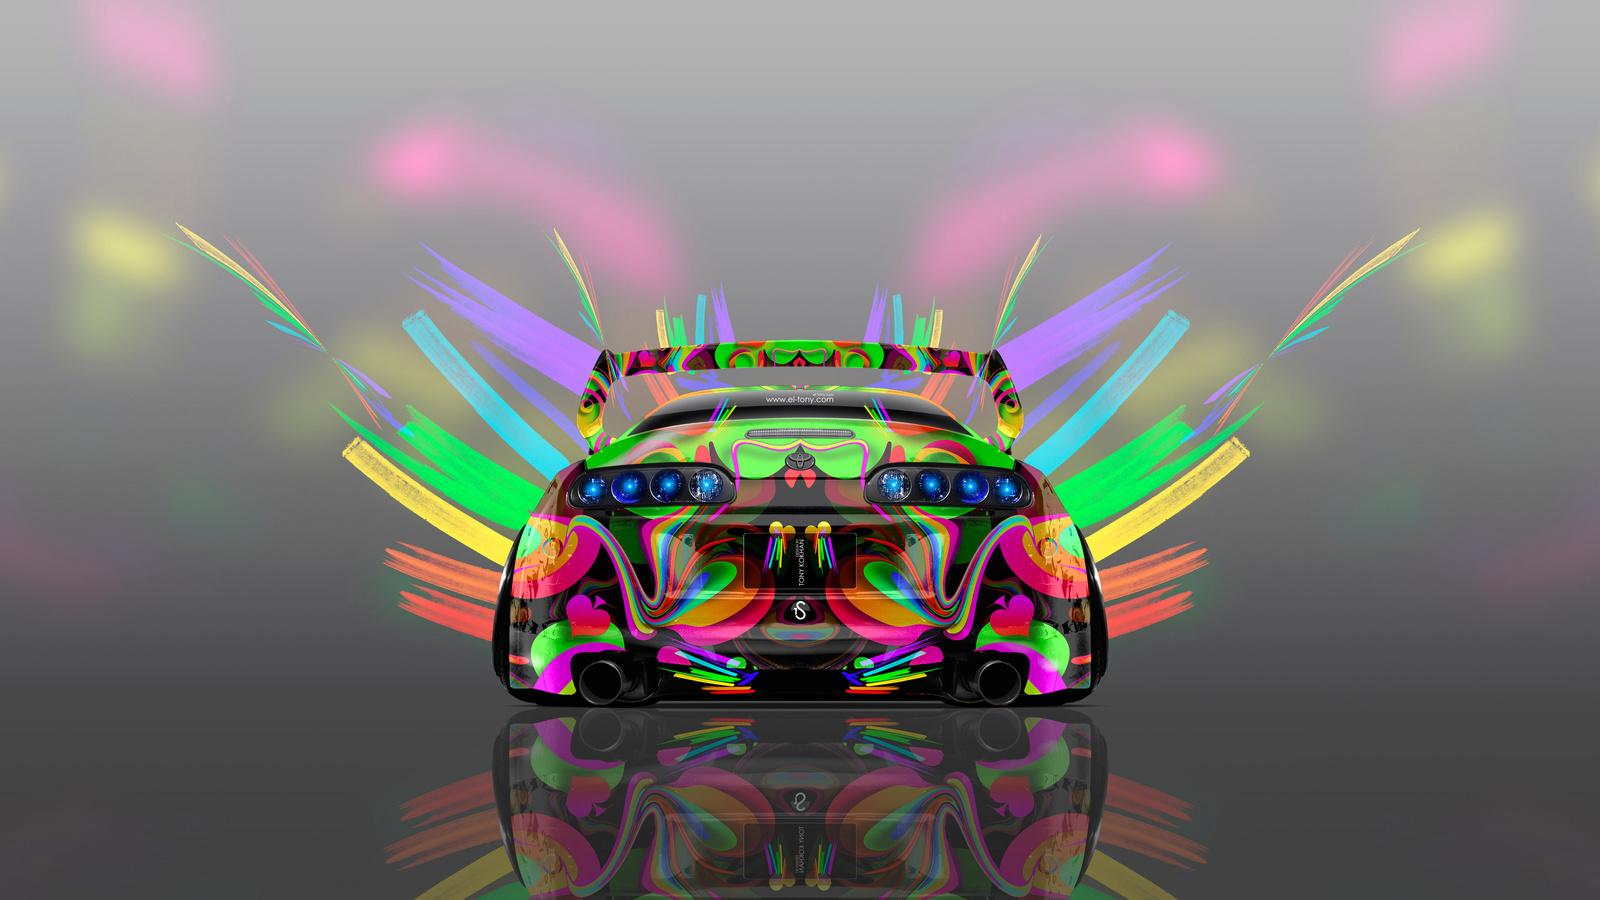 tony kokhan, toyota, supra, jdm, super, abstract, aerography, multicolors, neon, 4k, wallpapers, design, art, style, photoshop, тони кохан, фотошоп, тойота, супра, вид сзади, Яркая, разноцветная, машина, Яркое, разноцветное, авто, аэрография, абстракт, дж